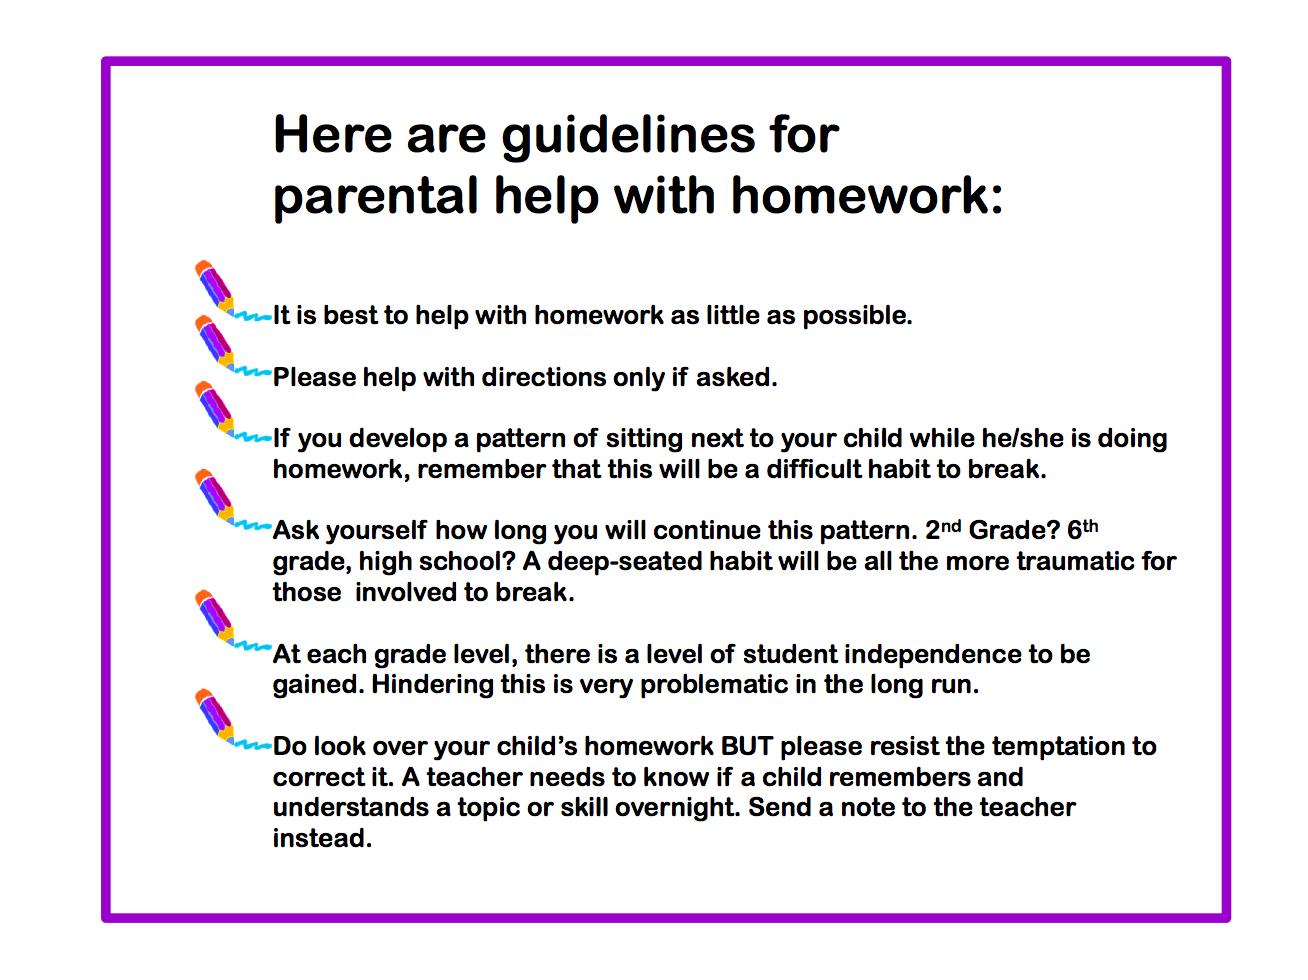 Homework help for parents tips